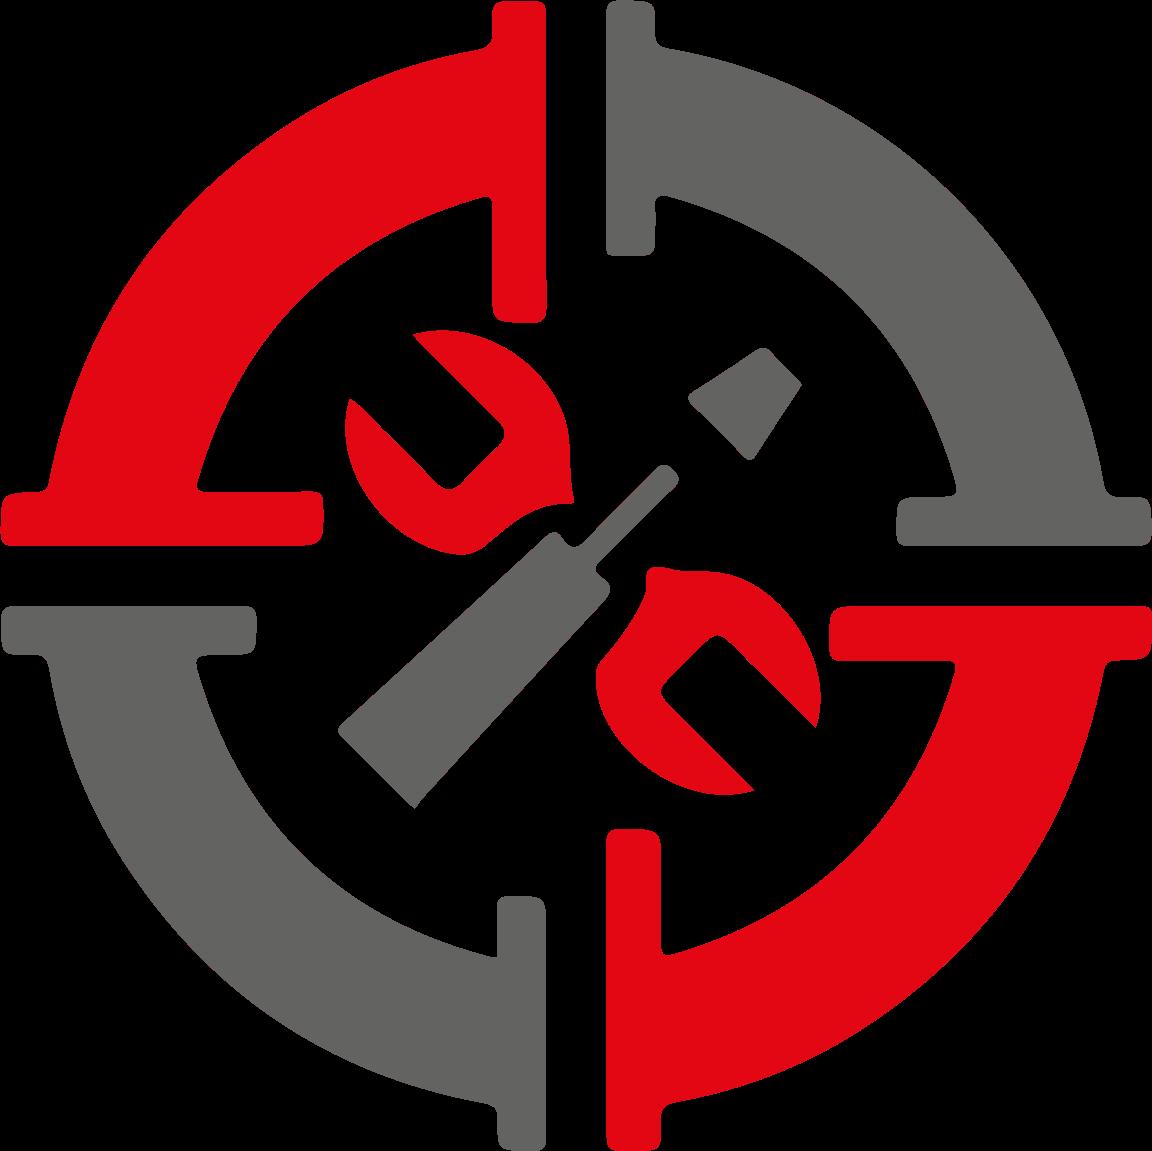 logo rescate24